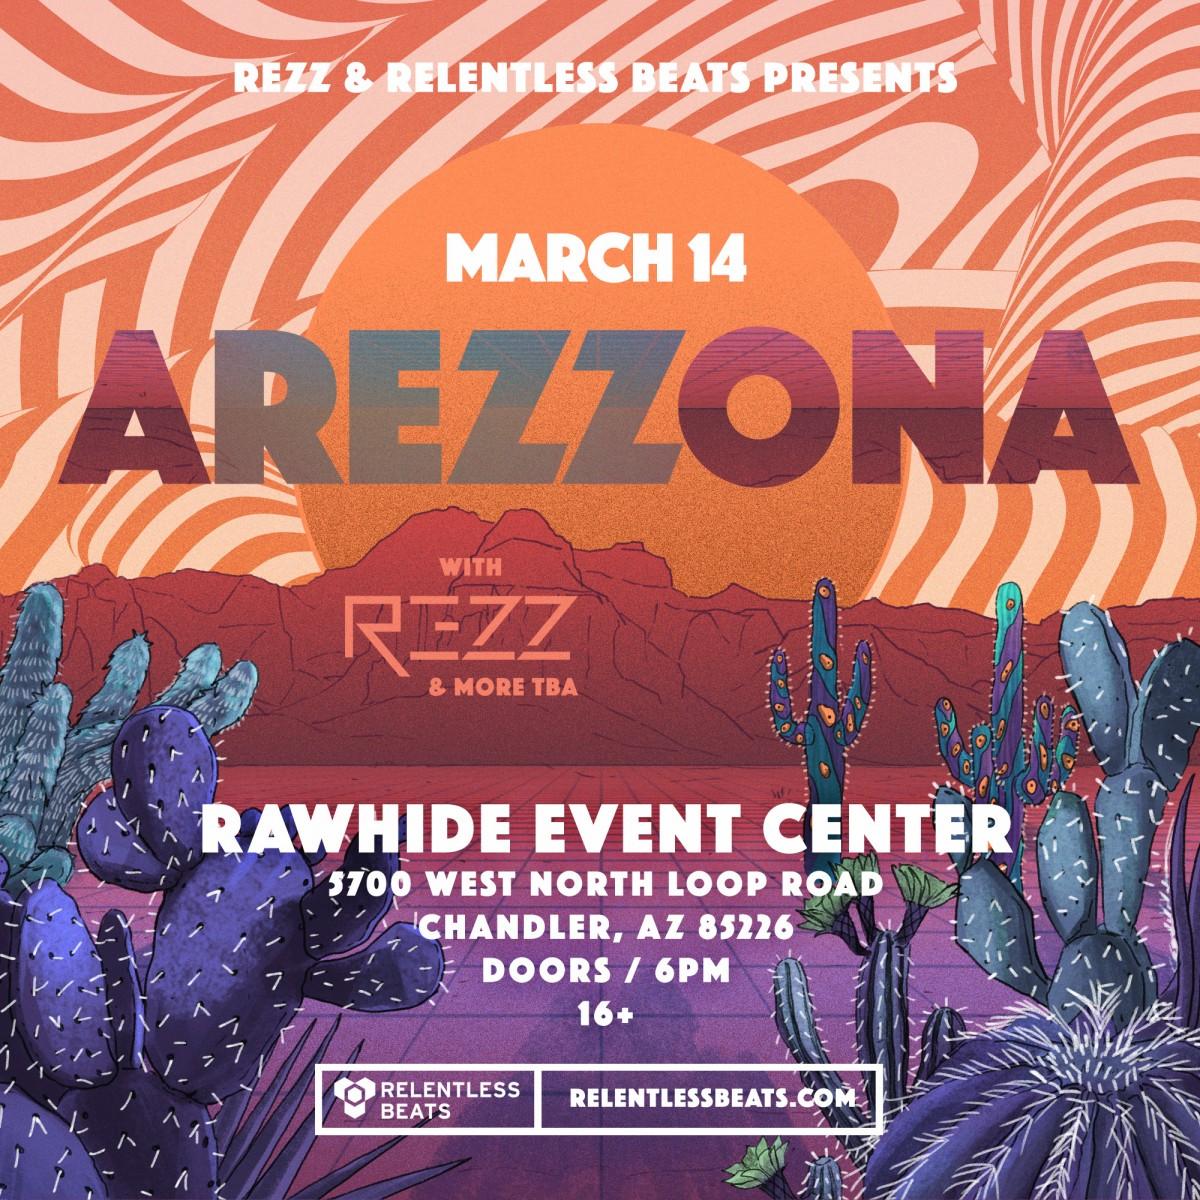 Flyer for AREZZONA Ft. REZZ